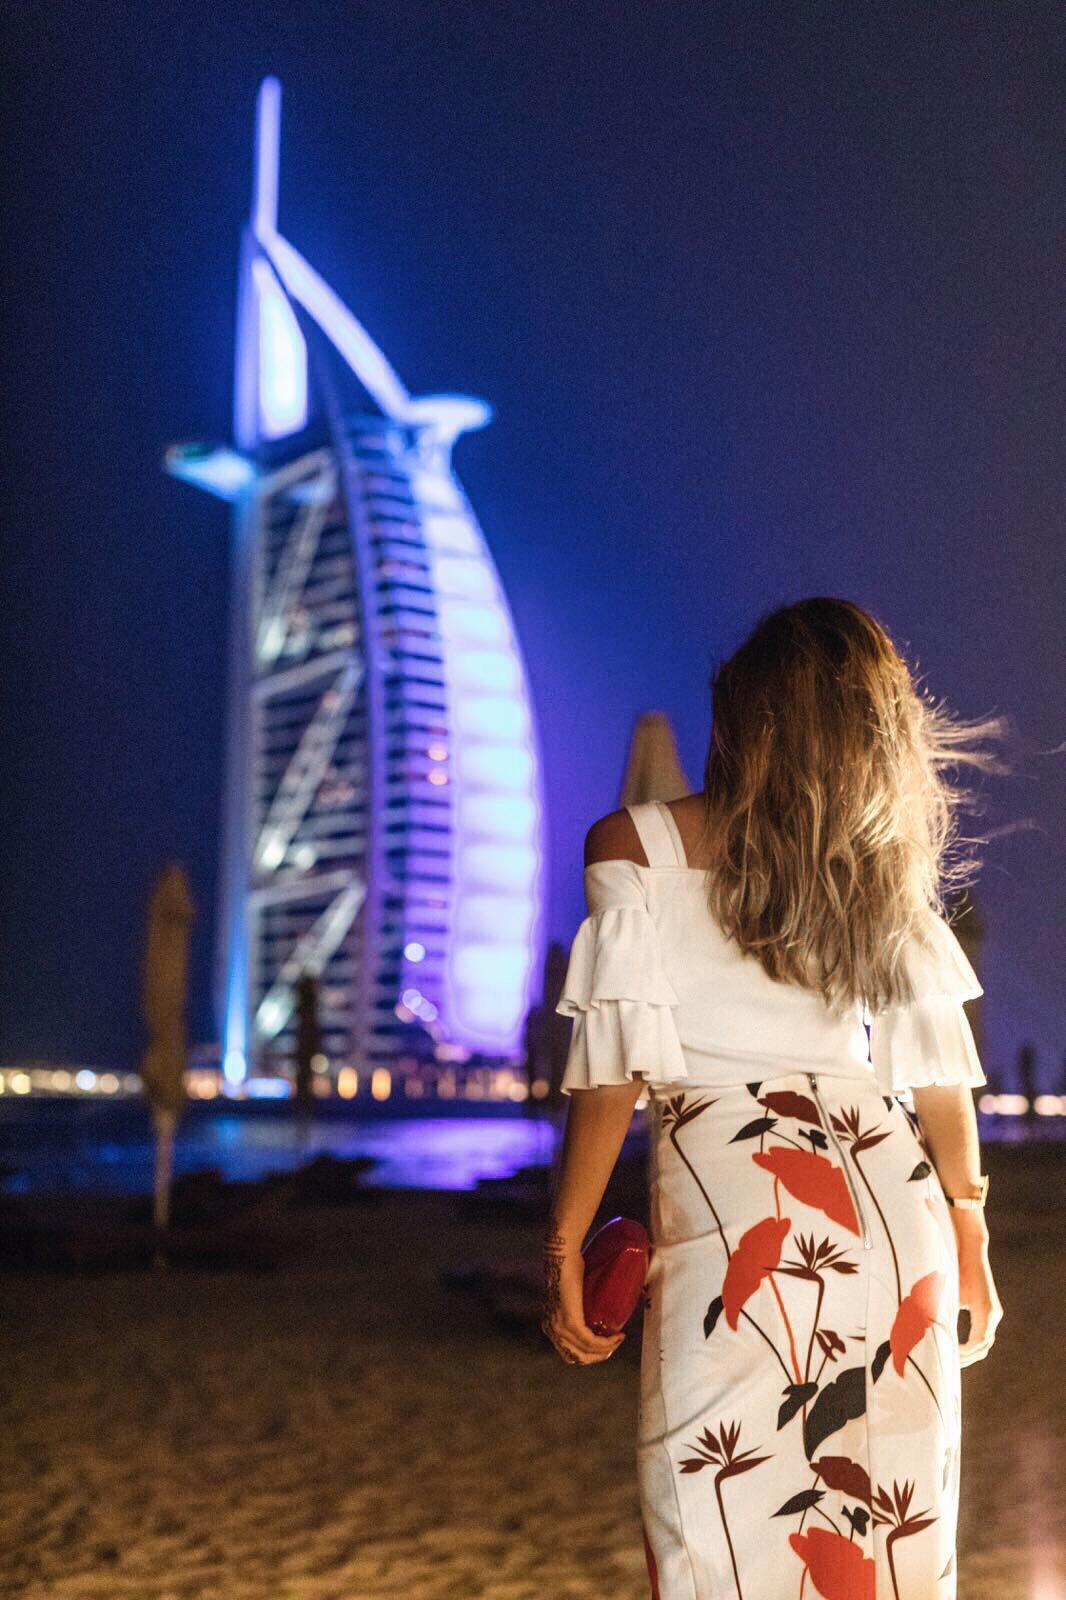 Whitney's Wonderland NYC Top Fashion and Travel Blogger at Burj al Arab